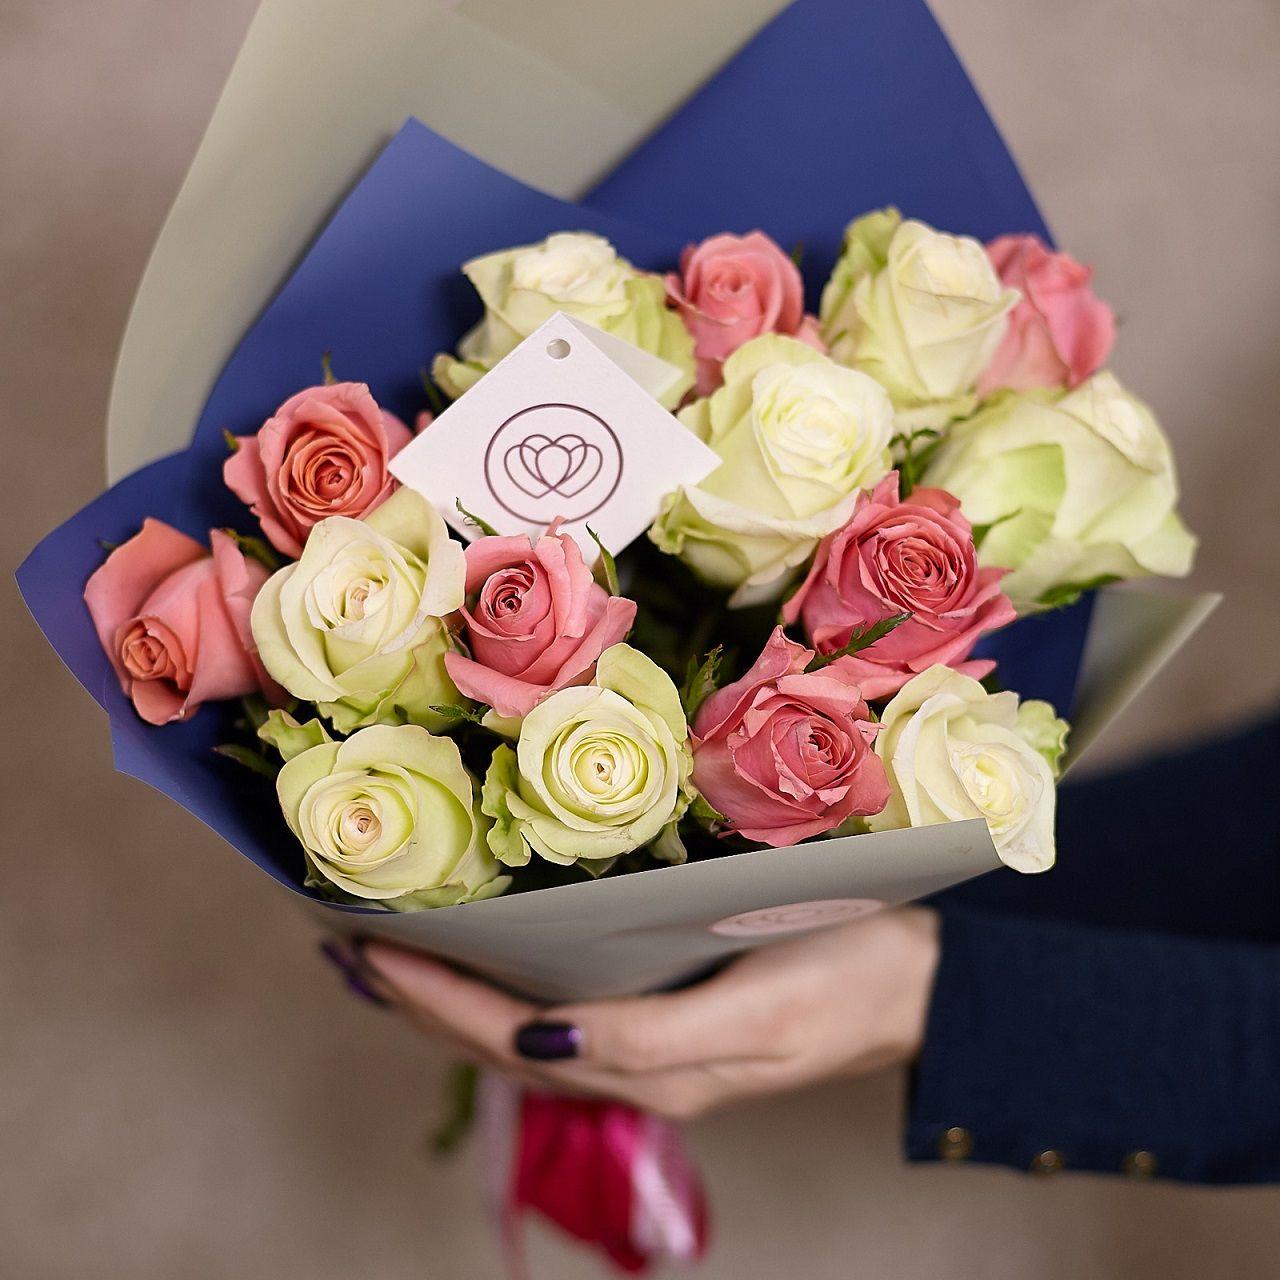 15 белых и розовых роз 40 см Premium фото